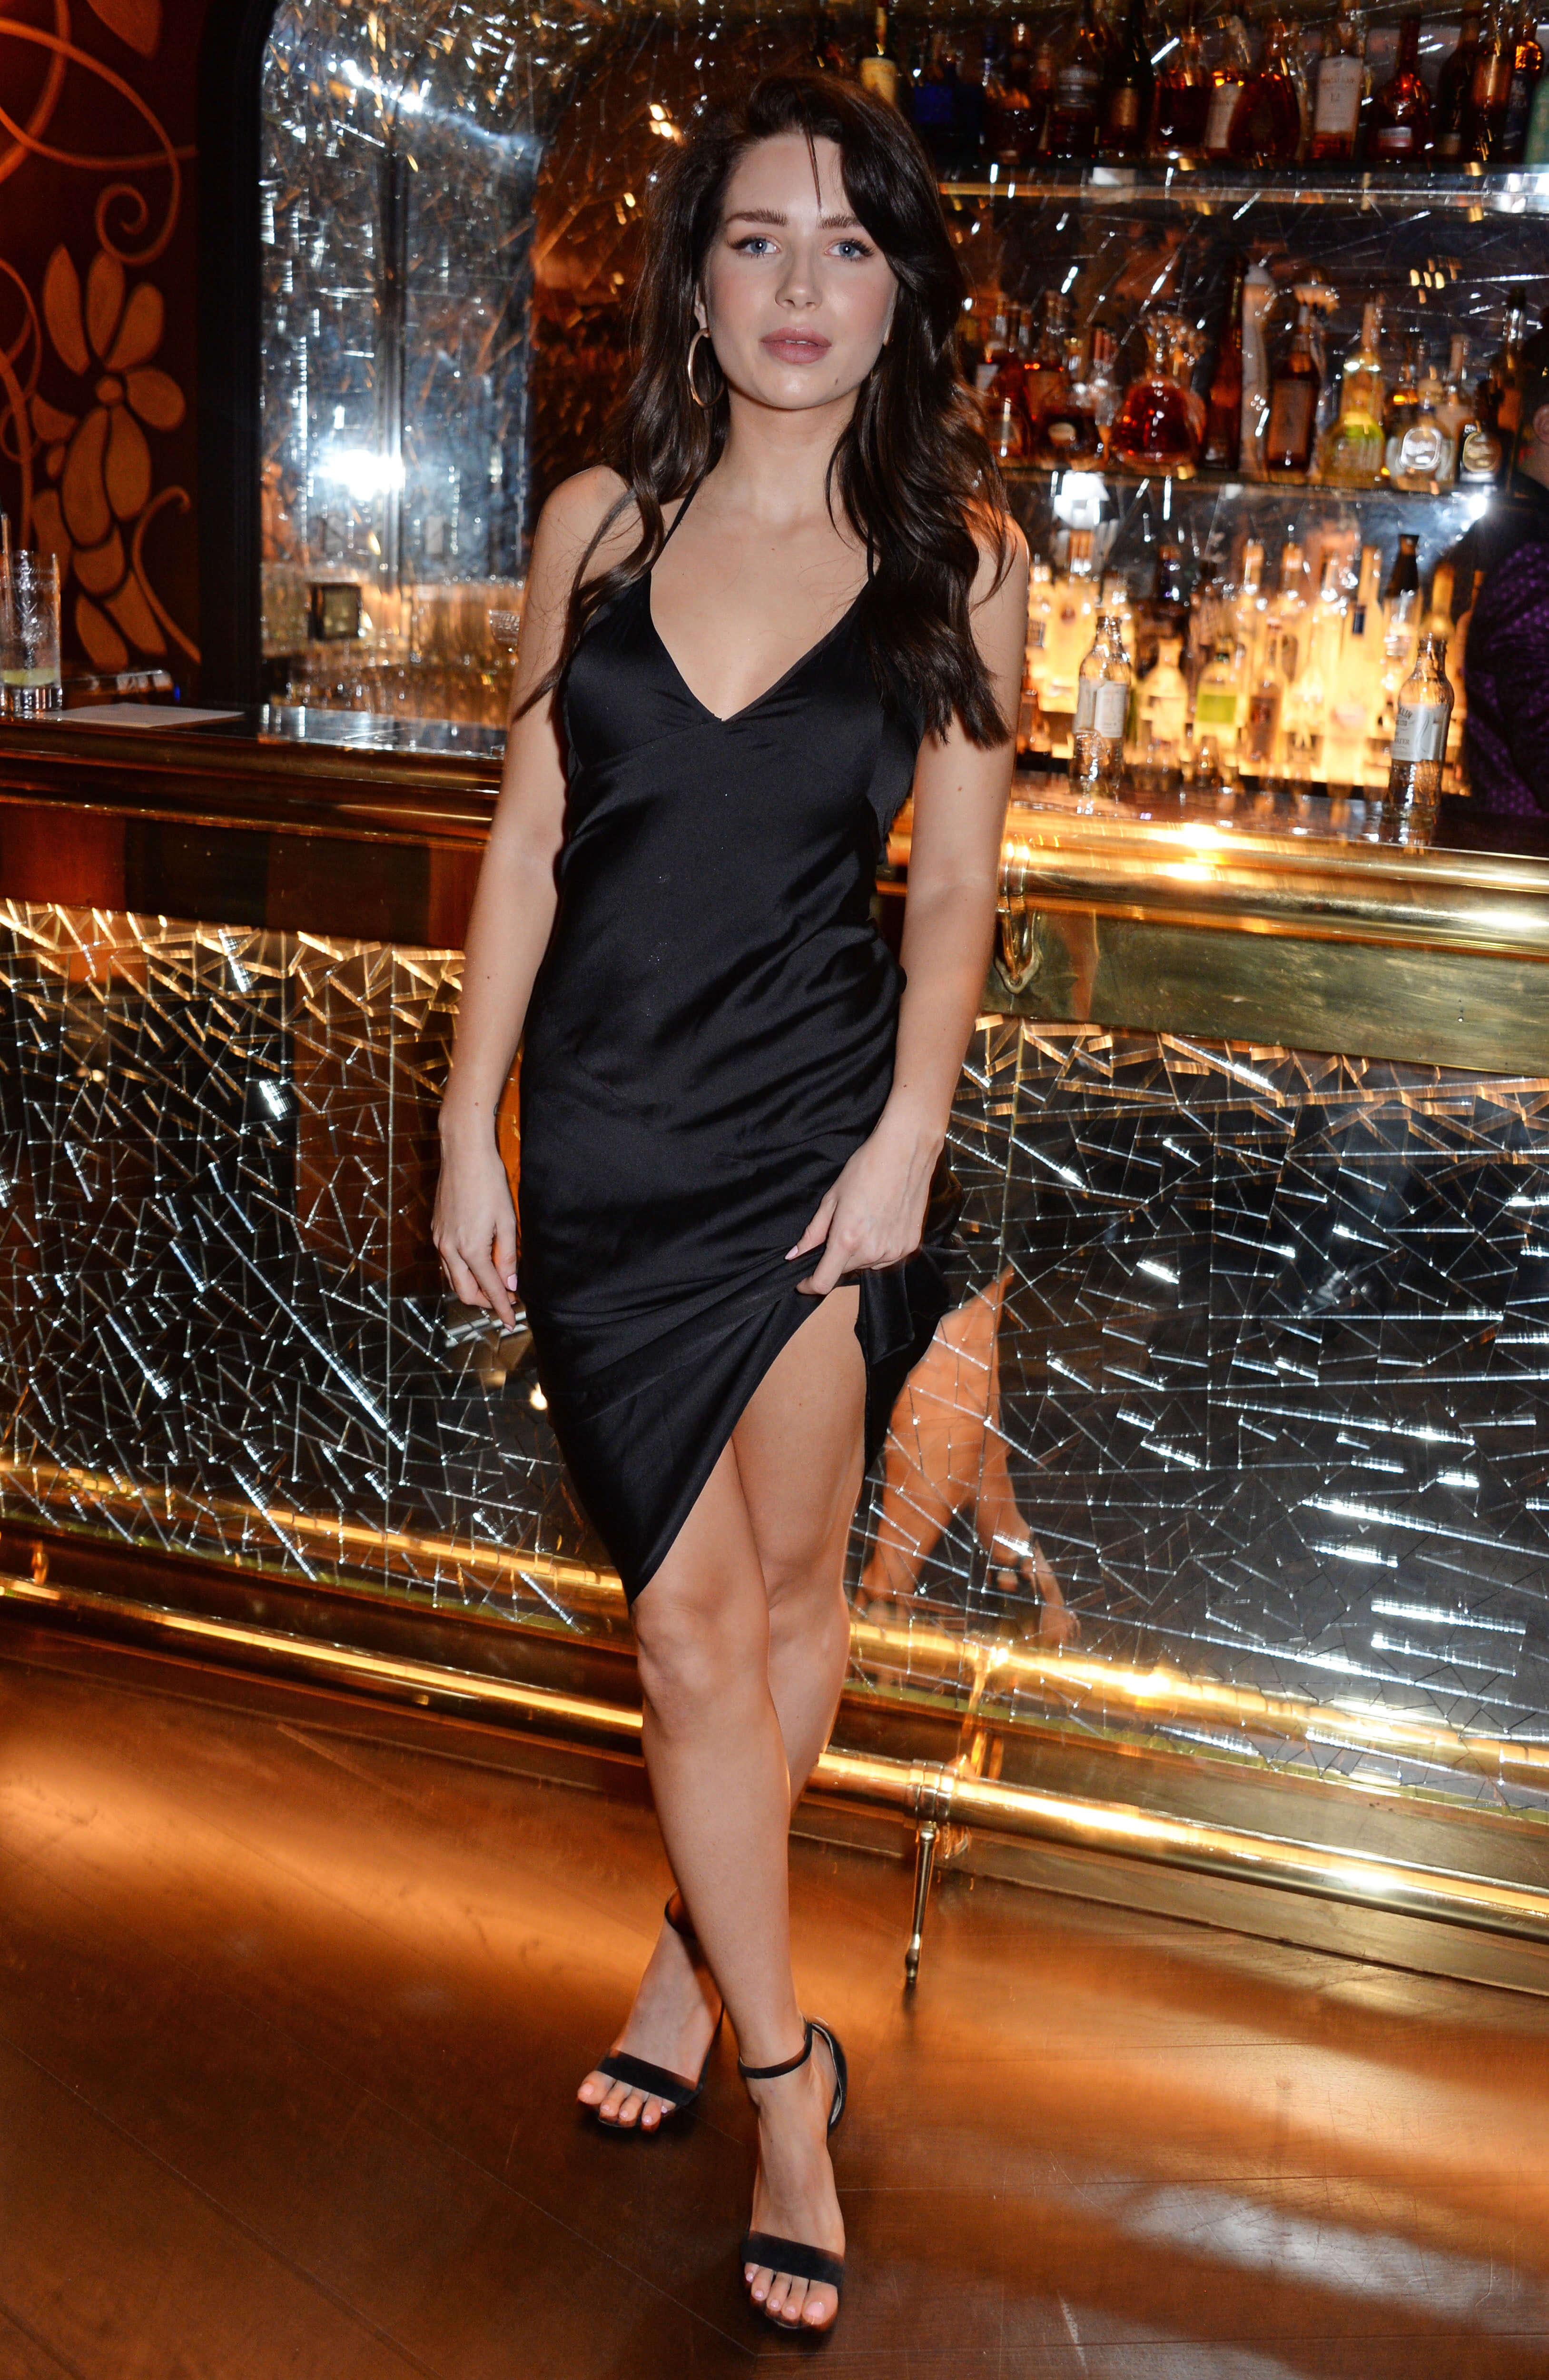 The Hottest Lottie Moss Photos On The Net - 12thBlog